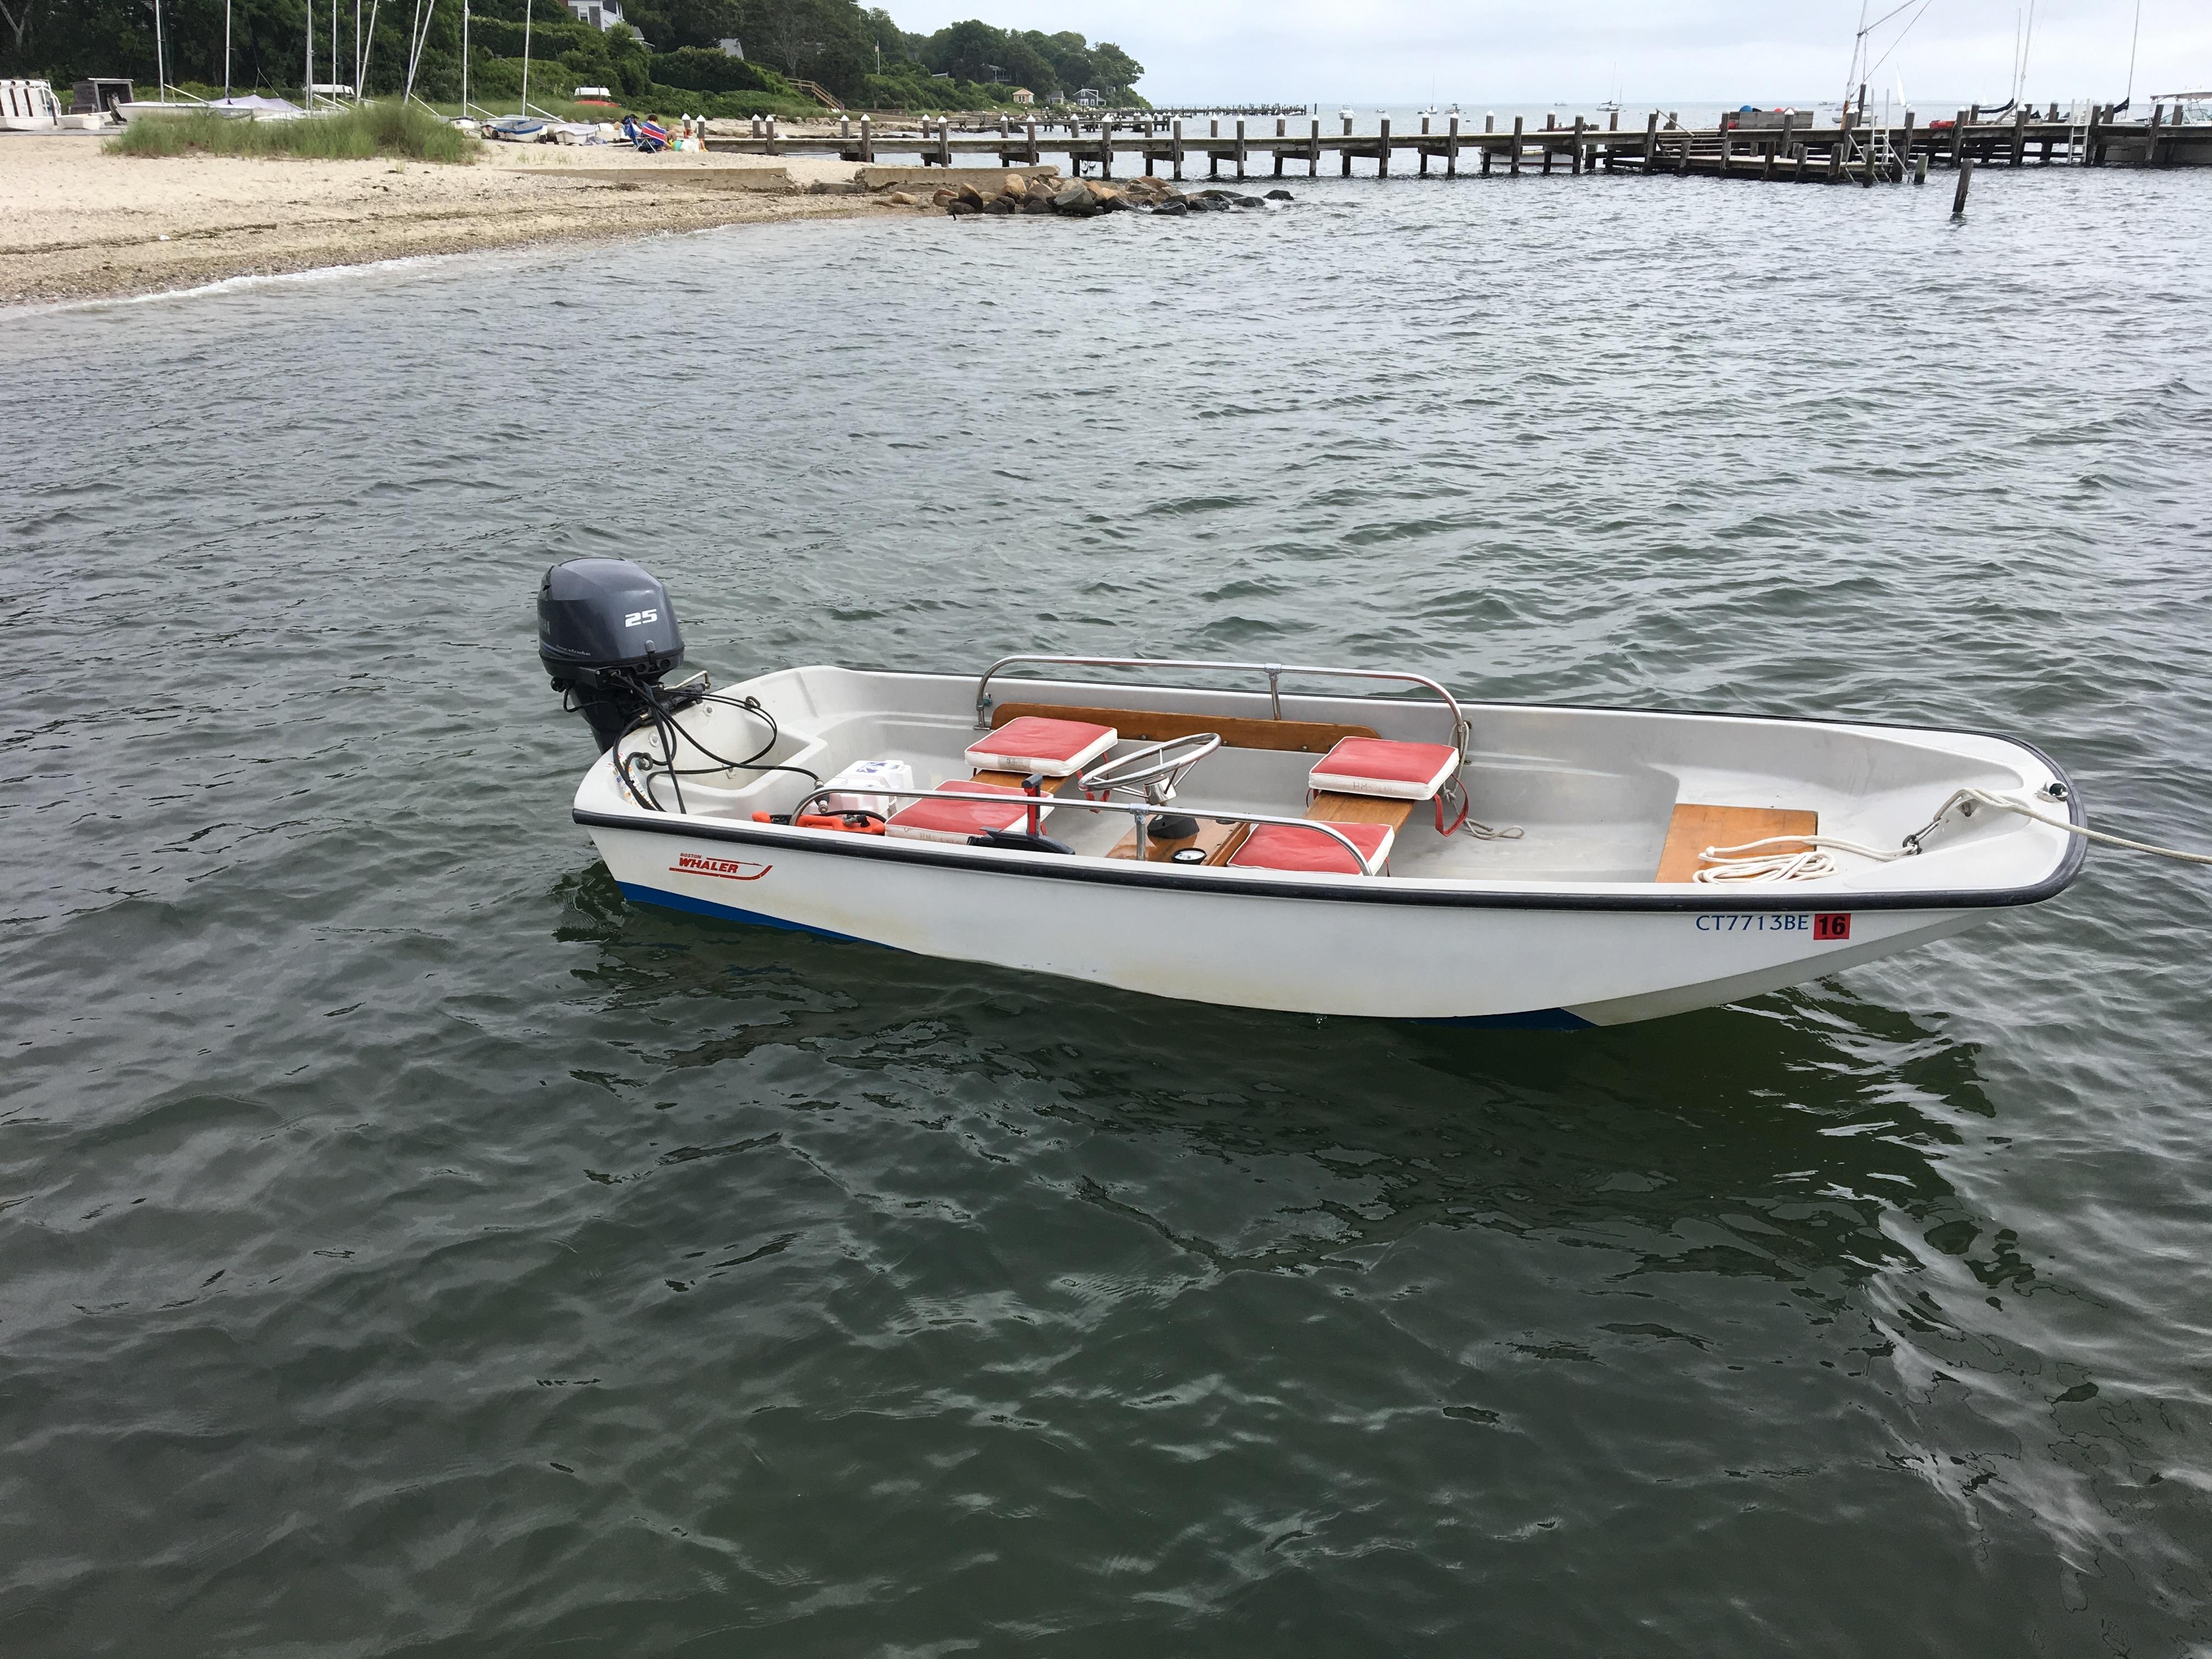 Boston Whaler 13 classic